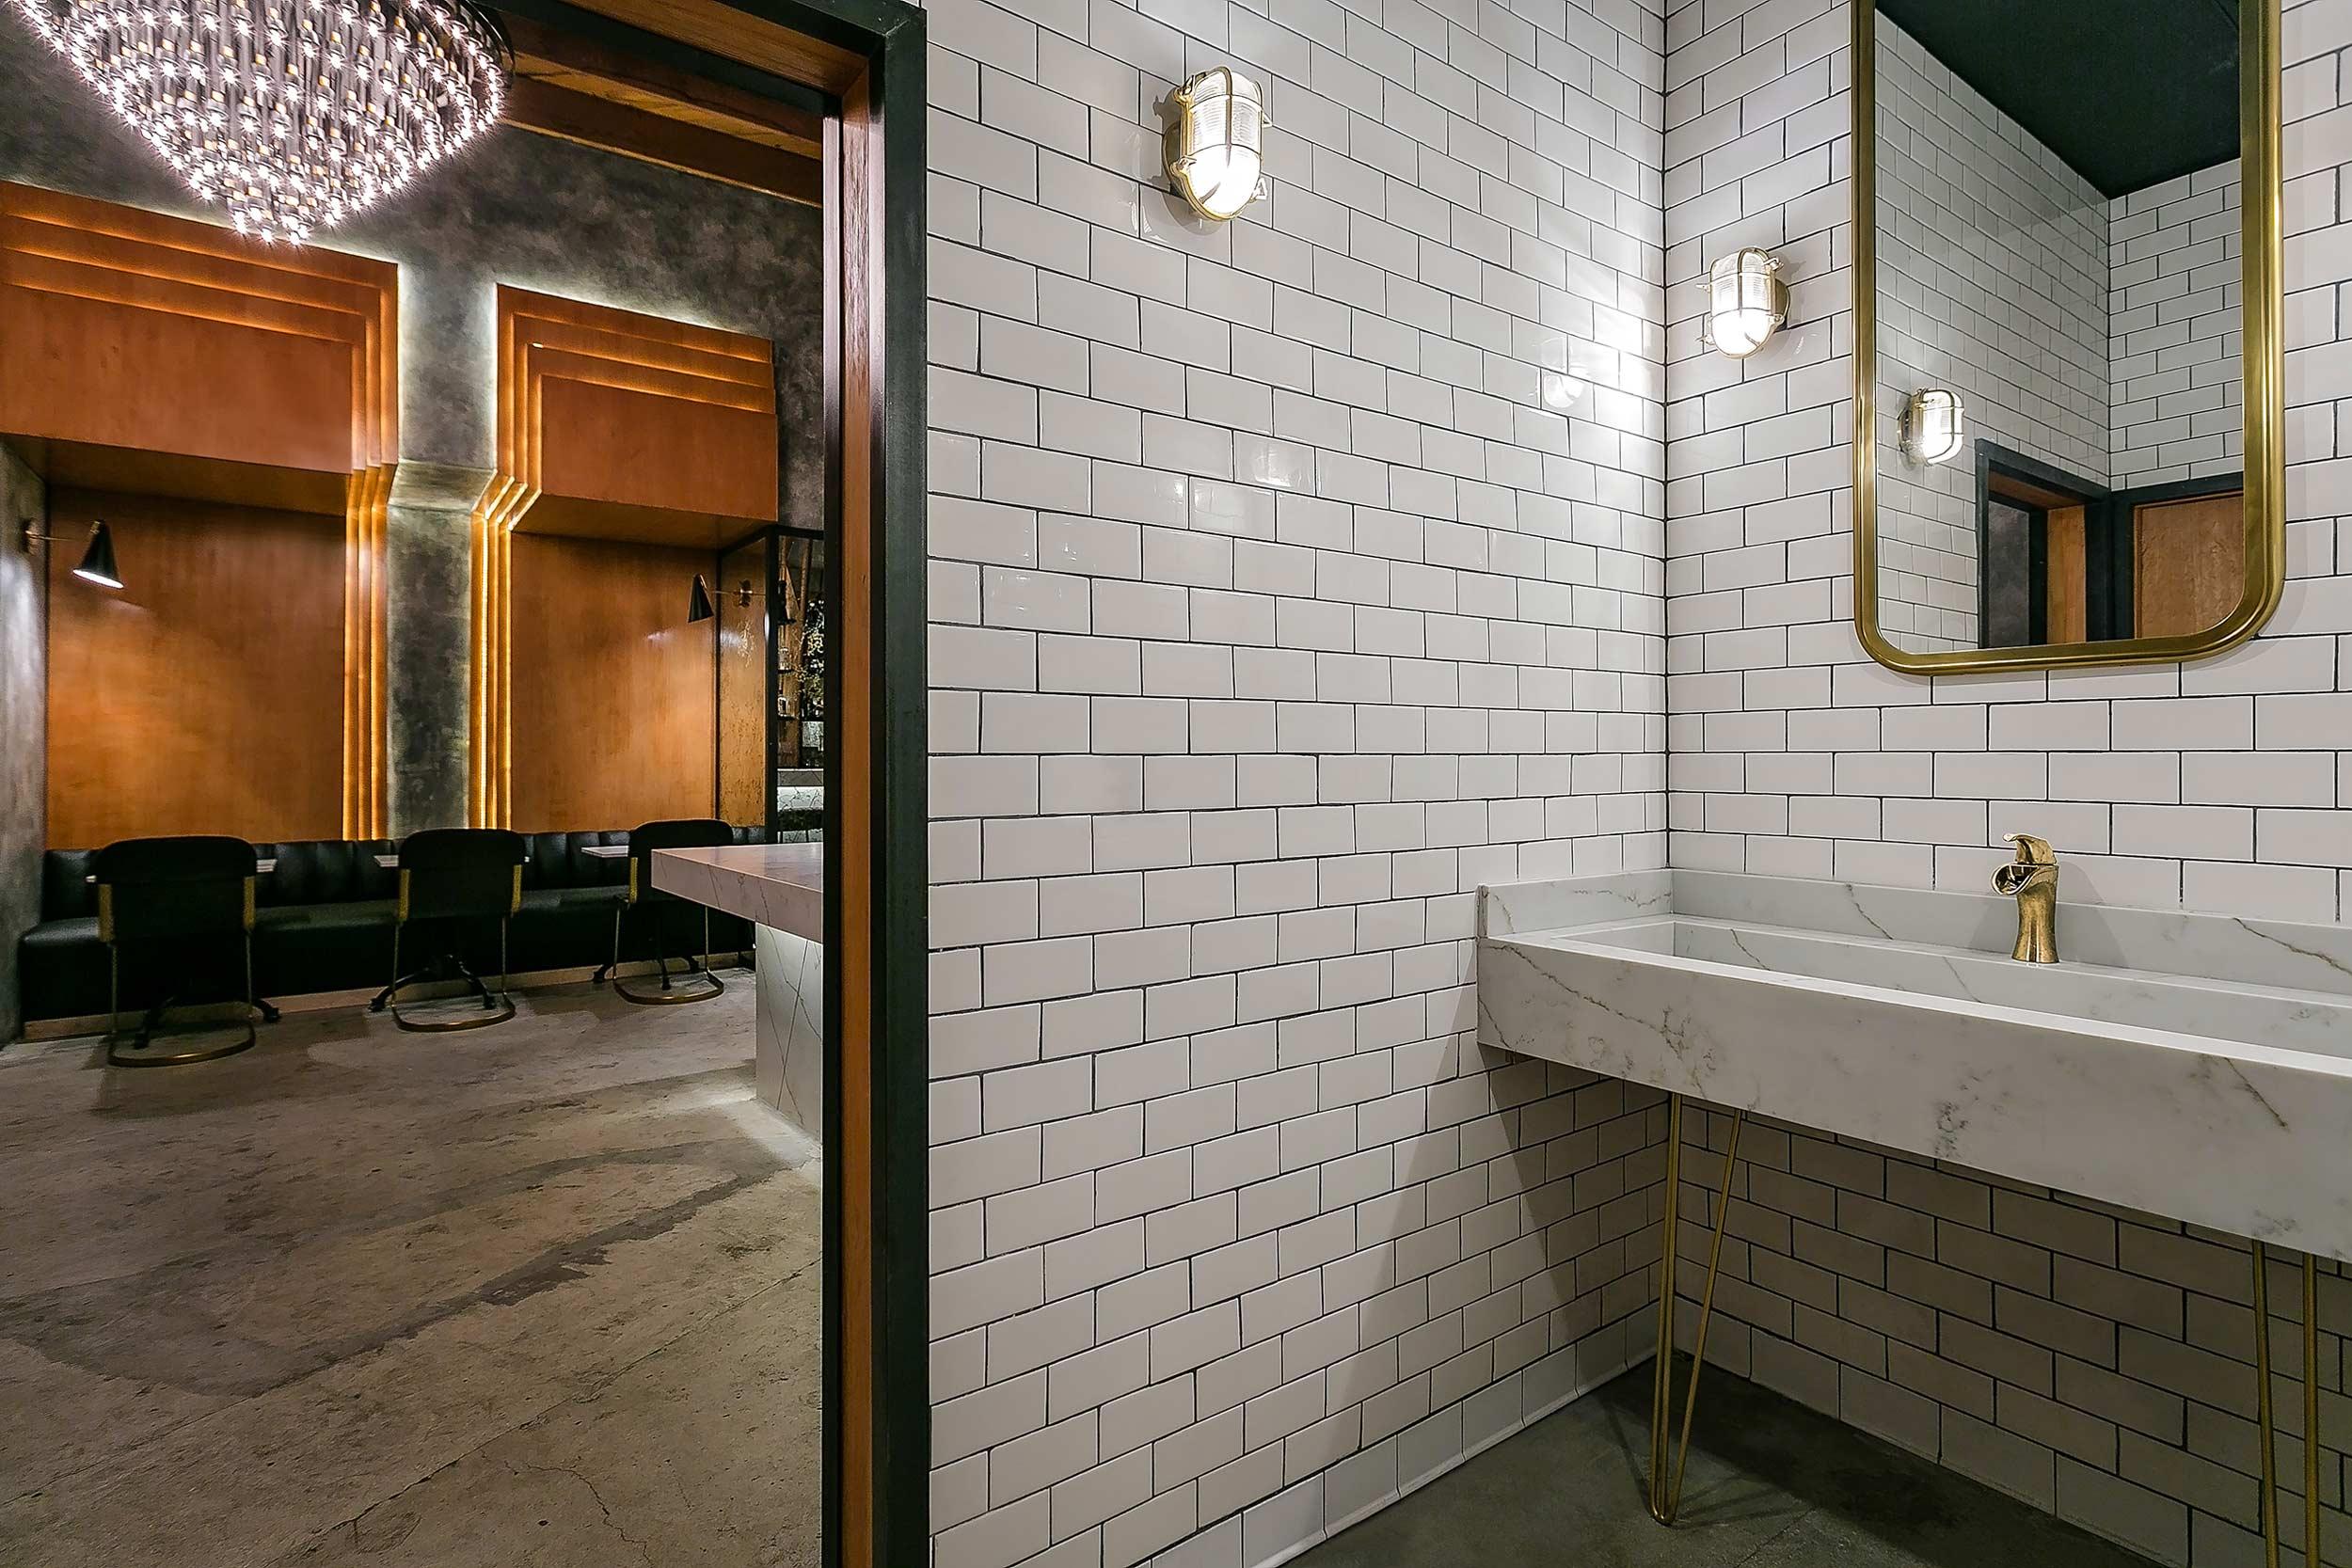 archillusion-design-melrose-station-restaurant-bar-public-restroom-entry.jpg